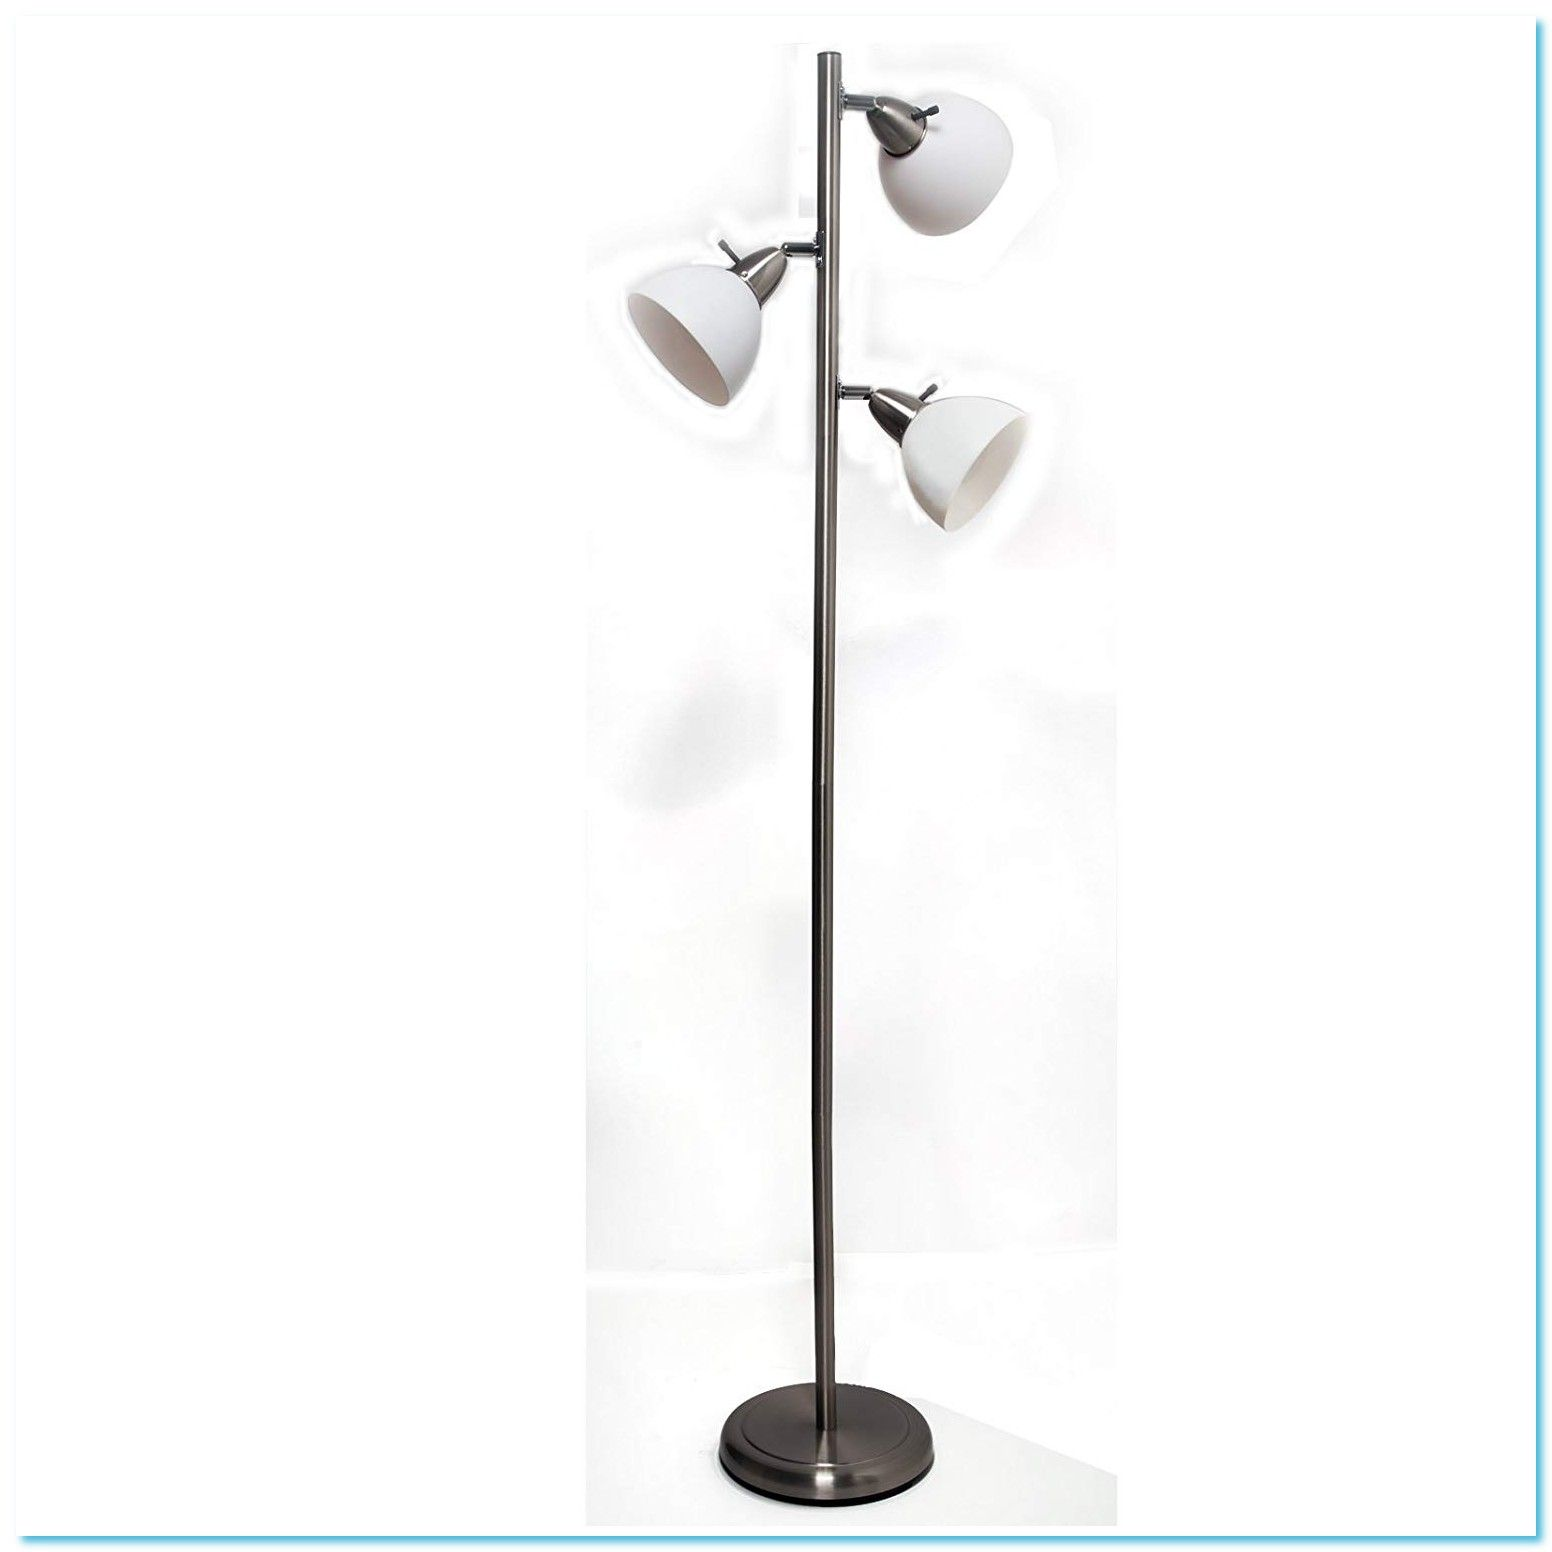 42 Reference Of 3 Light Tree Lamp In 2020 Three Light Floor Lamp Tree Lamp Lamp